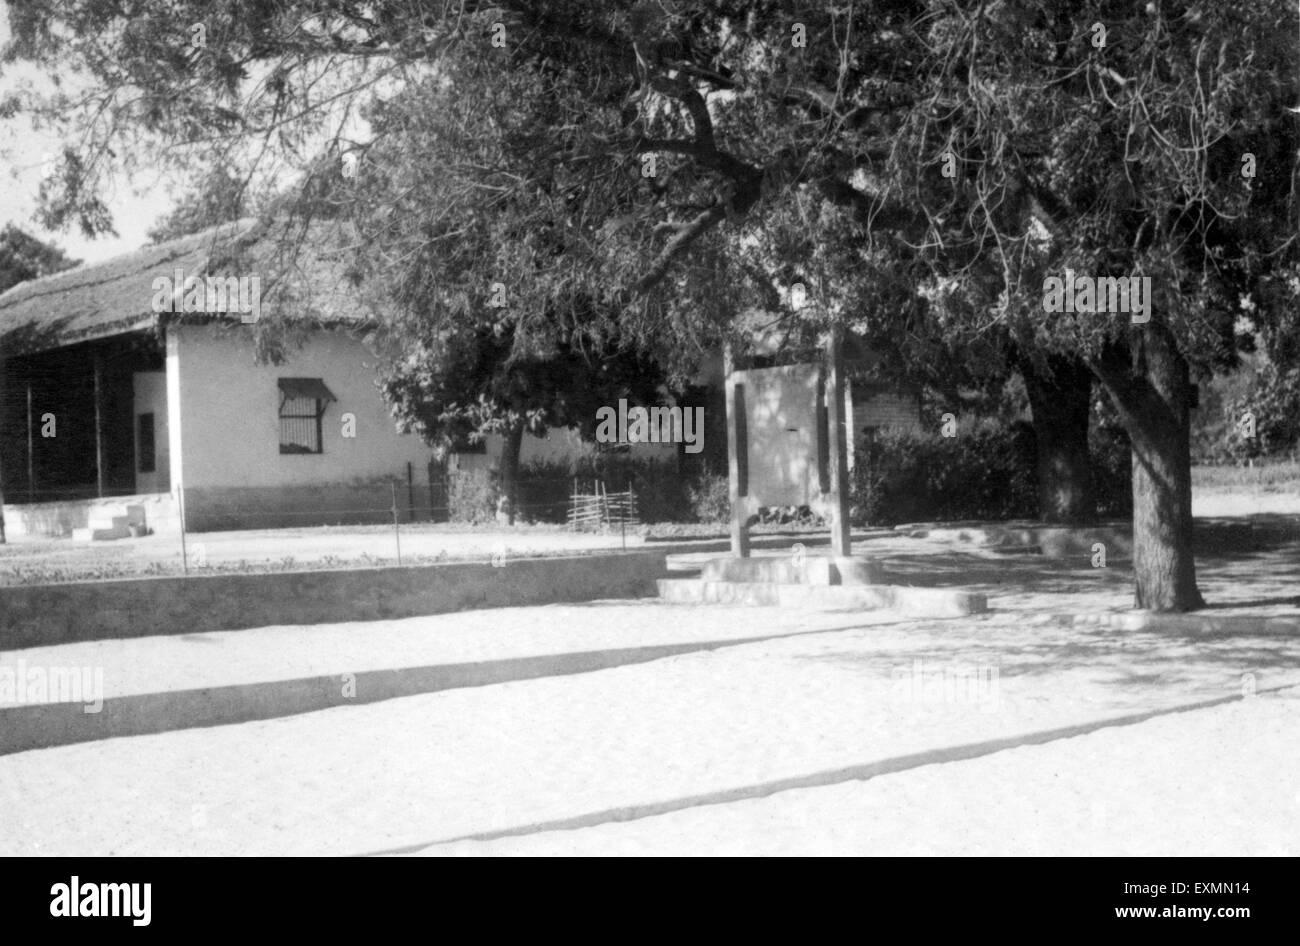 Hriday Kunj Mahatma Gandhi house Satyagraha Ashram Ahmedabad gujrat india 1960 - Stock Image